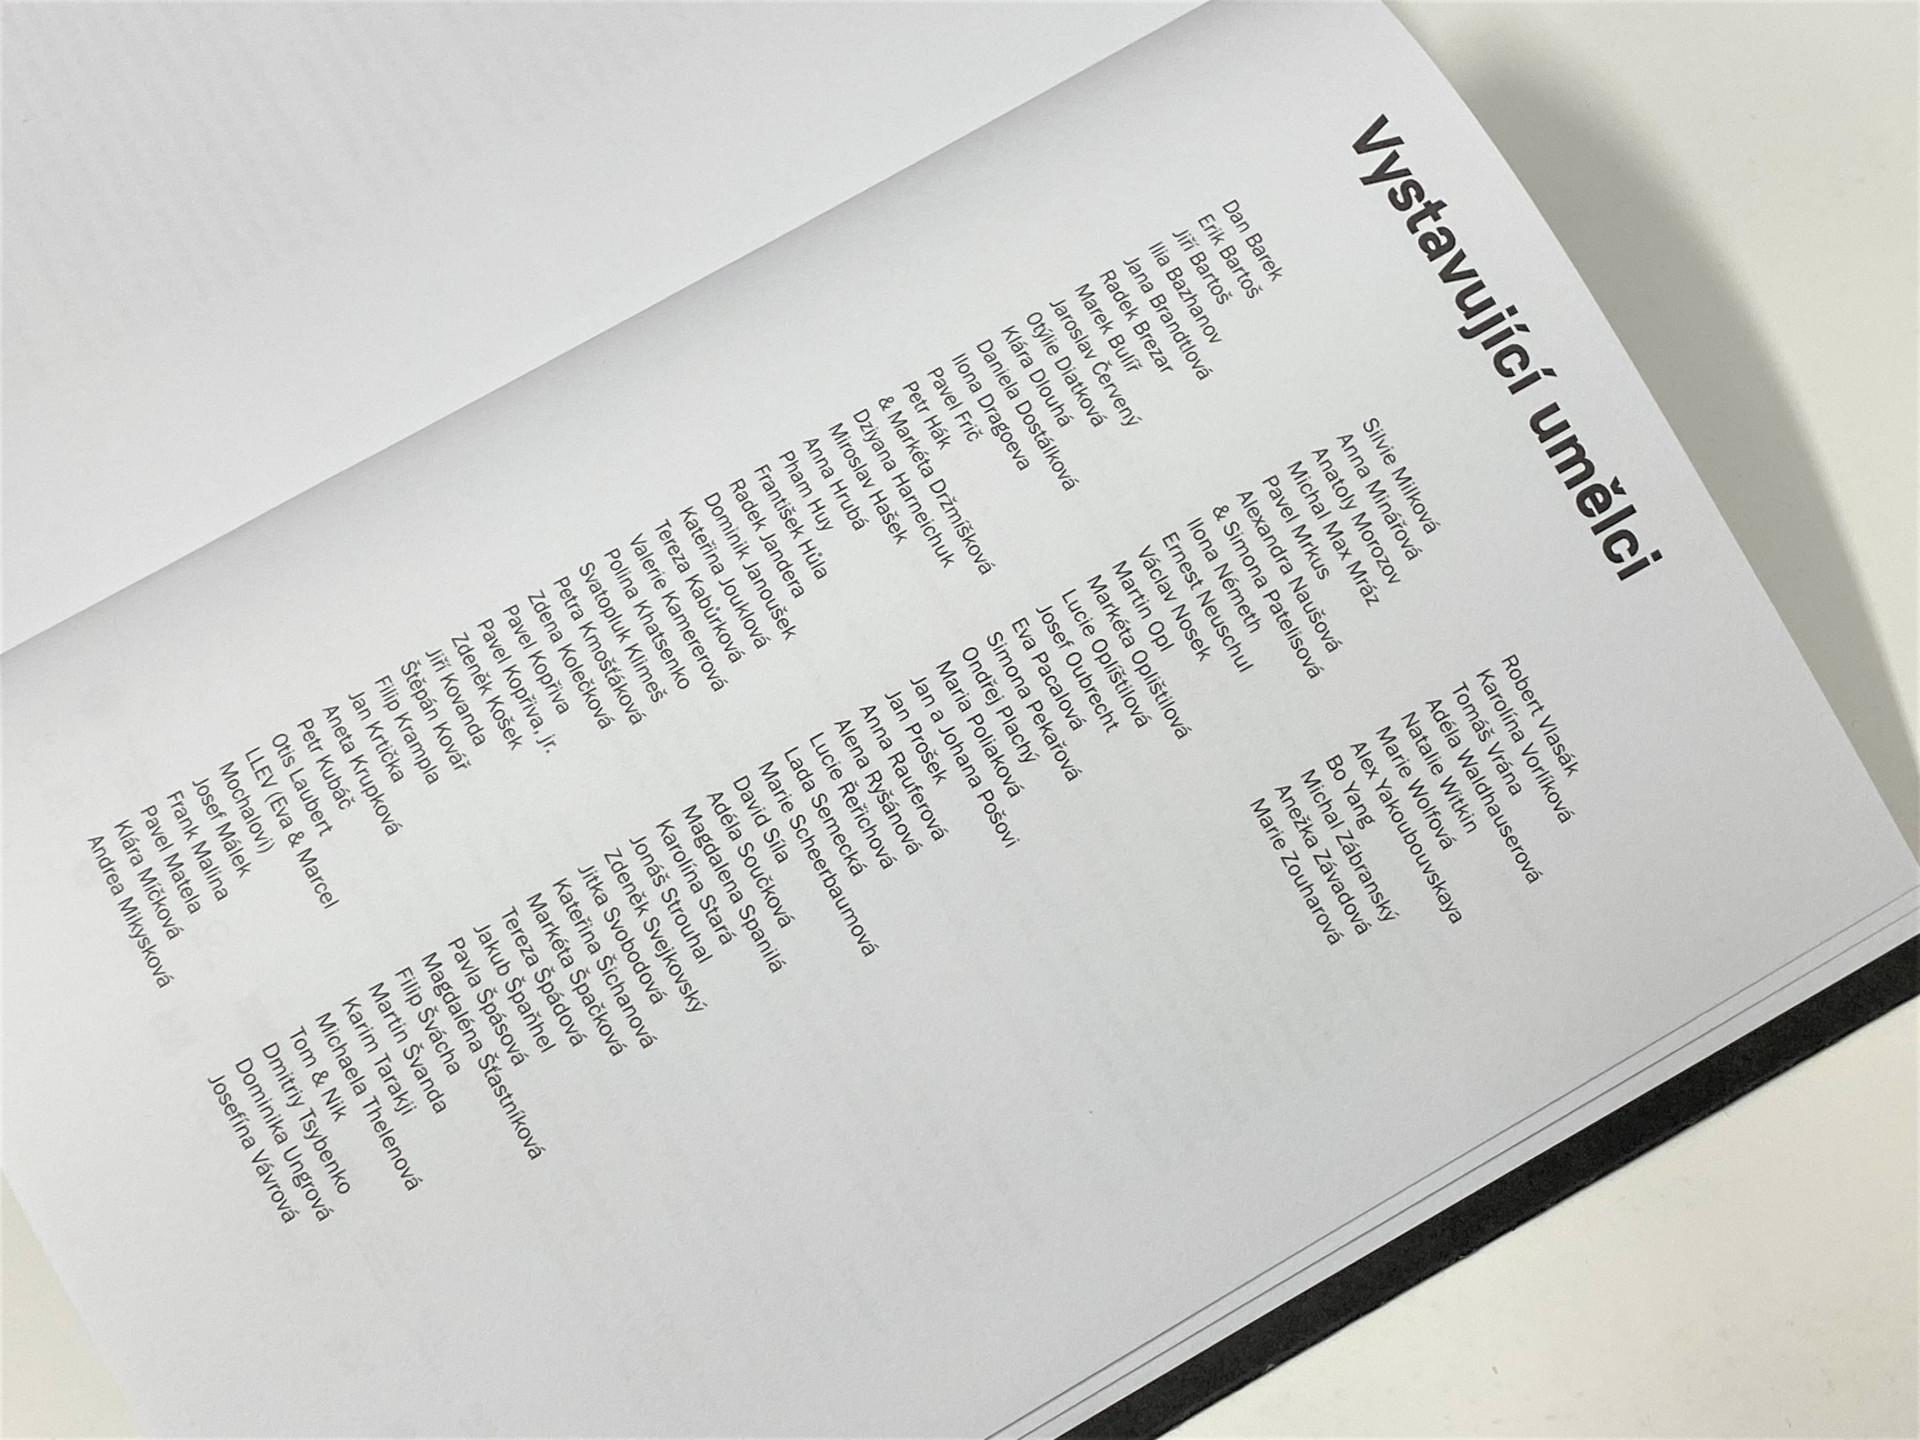 Mo-nu-mentalní topografie_kriticky_katalog-vystavujici-autori_Klara-Mrkusova